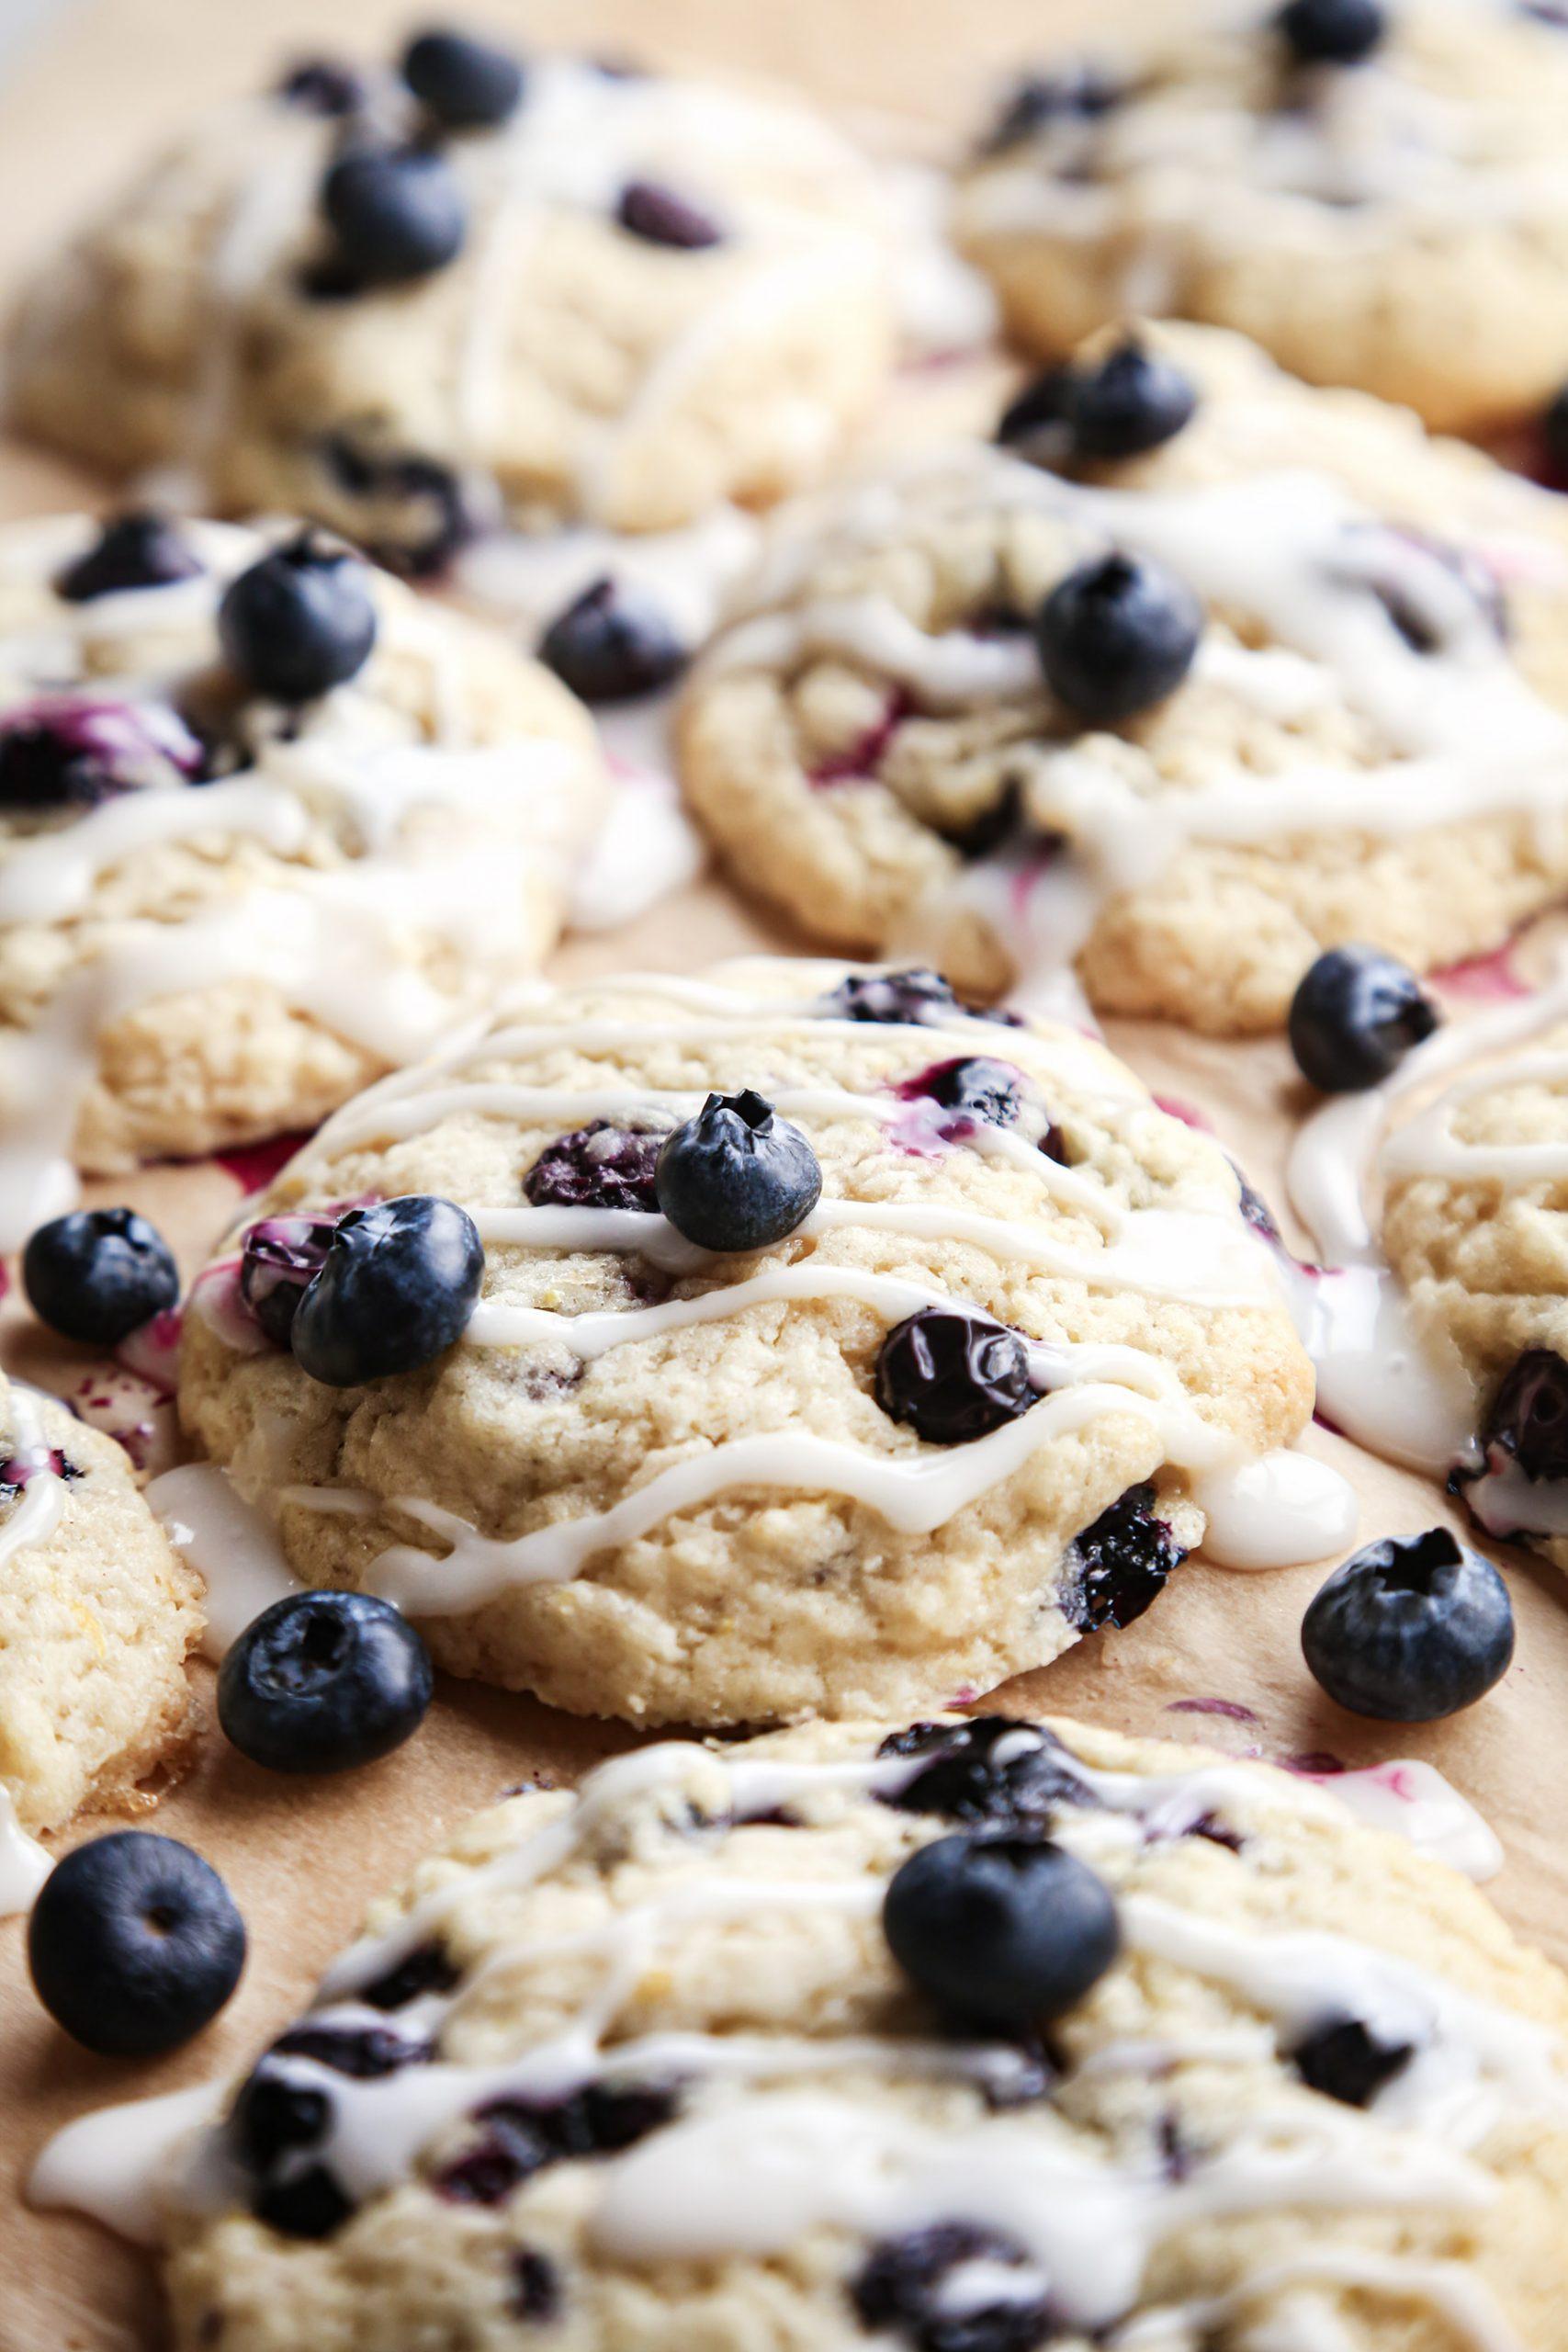 Soft Lemon Blueberry Cookies | Vegan Friendly with Gluten-Free Alternative